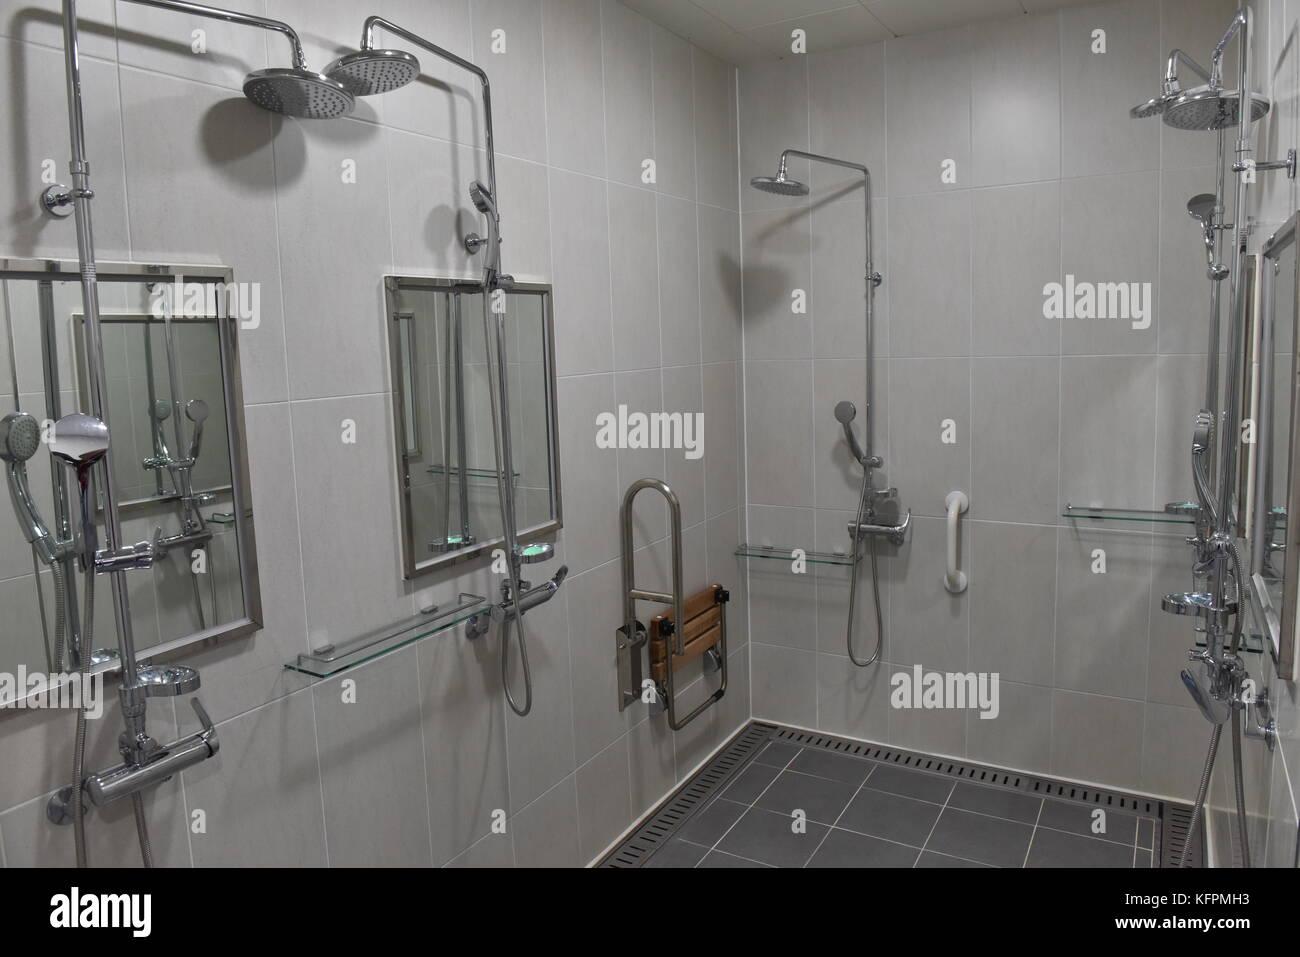 Locker Room And Shower Stock Photos & Locker Room And